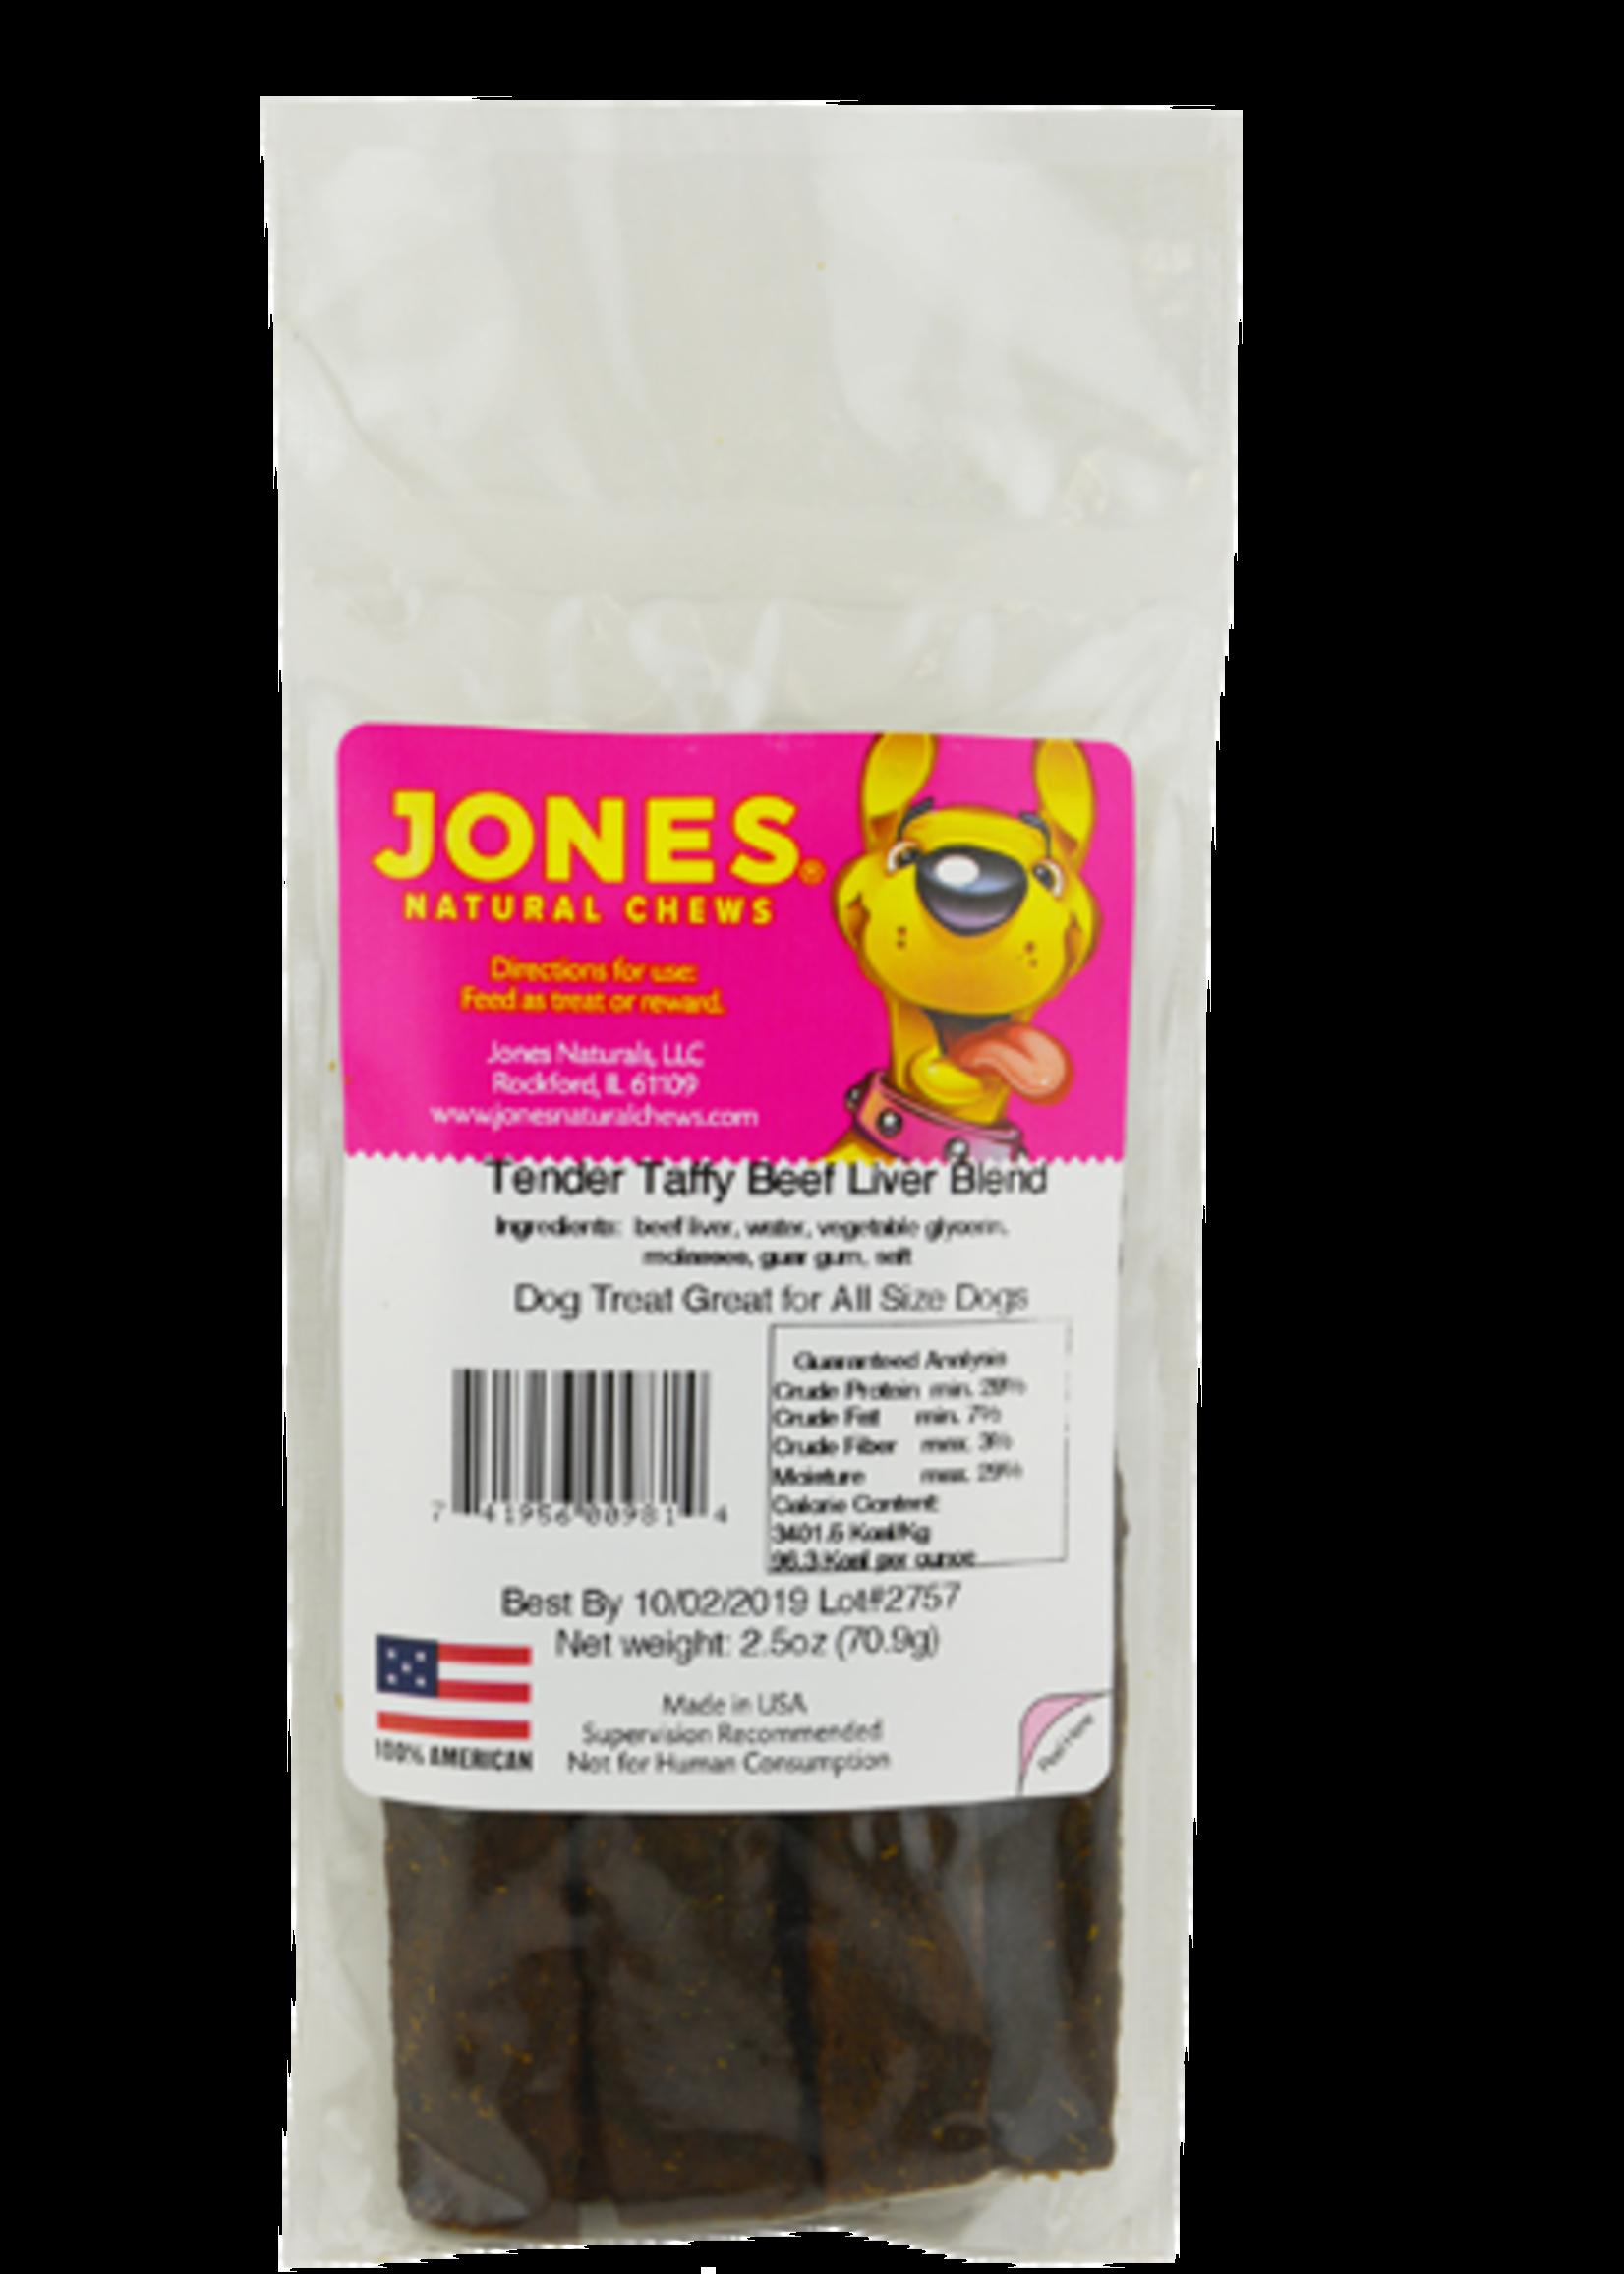 Jones Natural Chews Jones Natural Chews Tender Taffy Liver Blend